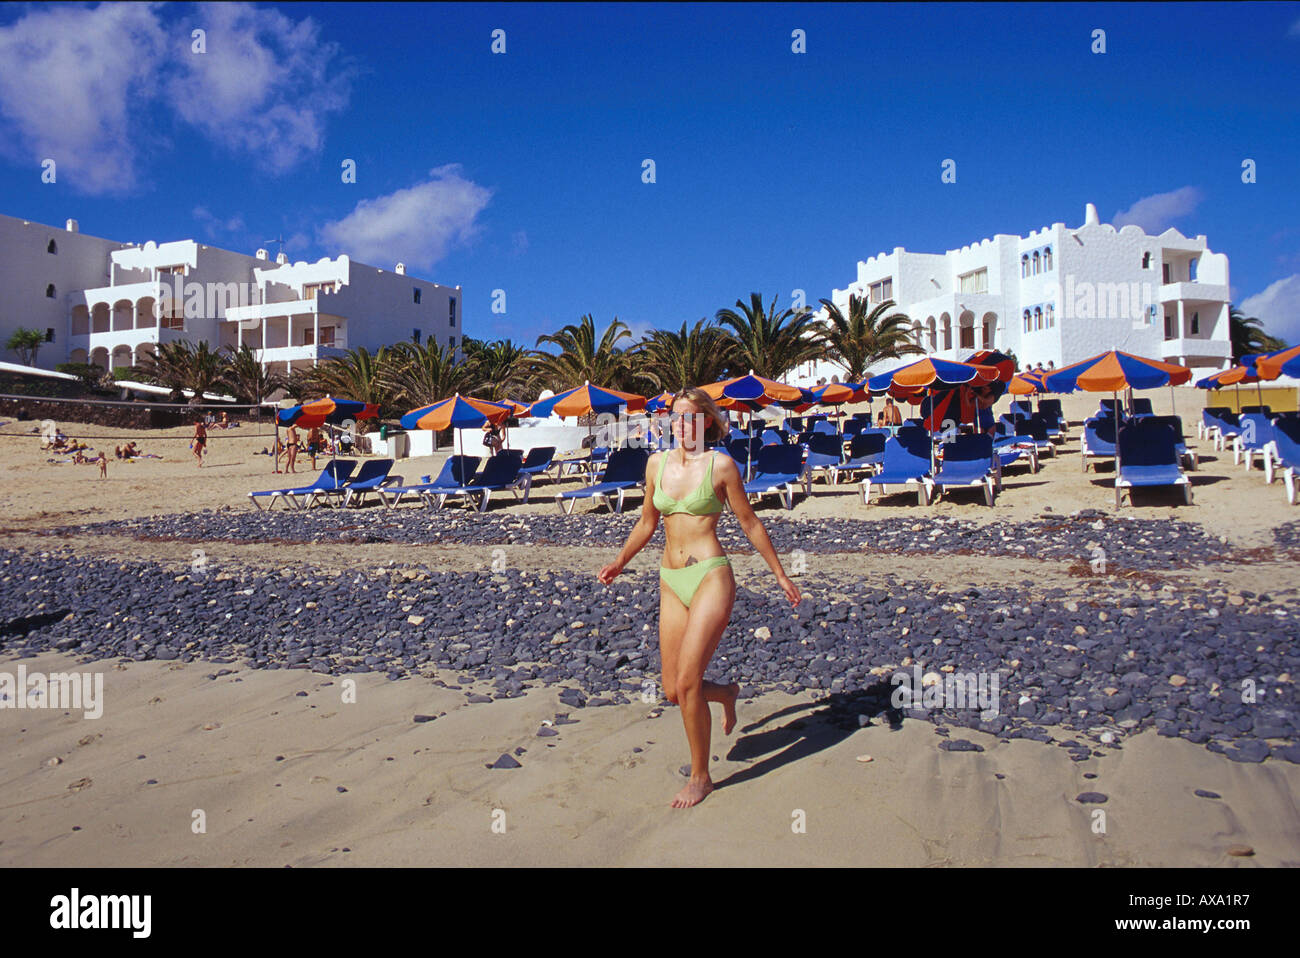 Chair on beach images buy chair on beach - Playa Costa Calma Costa Calma Fuerteventura Kanarische Inseln Stock